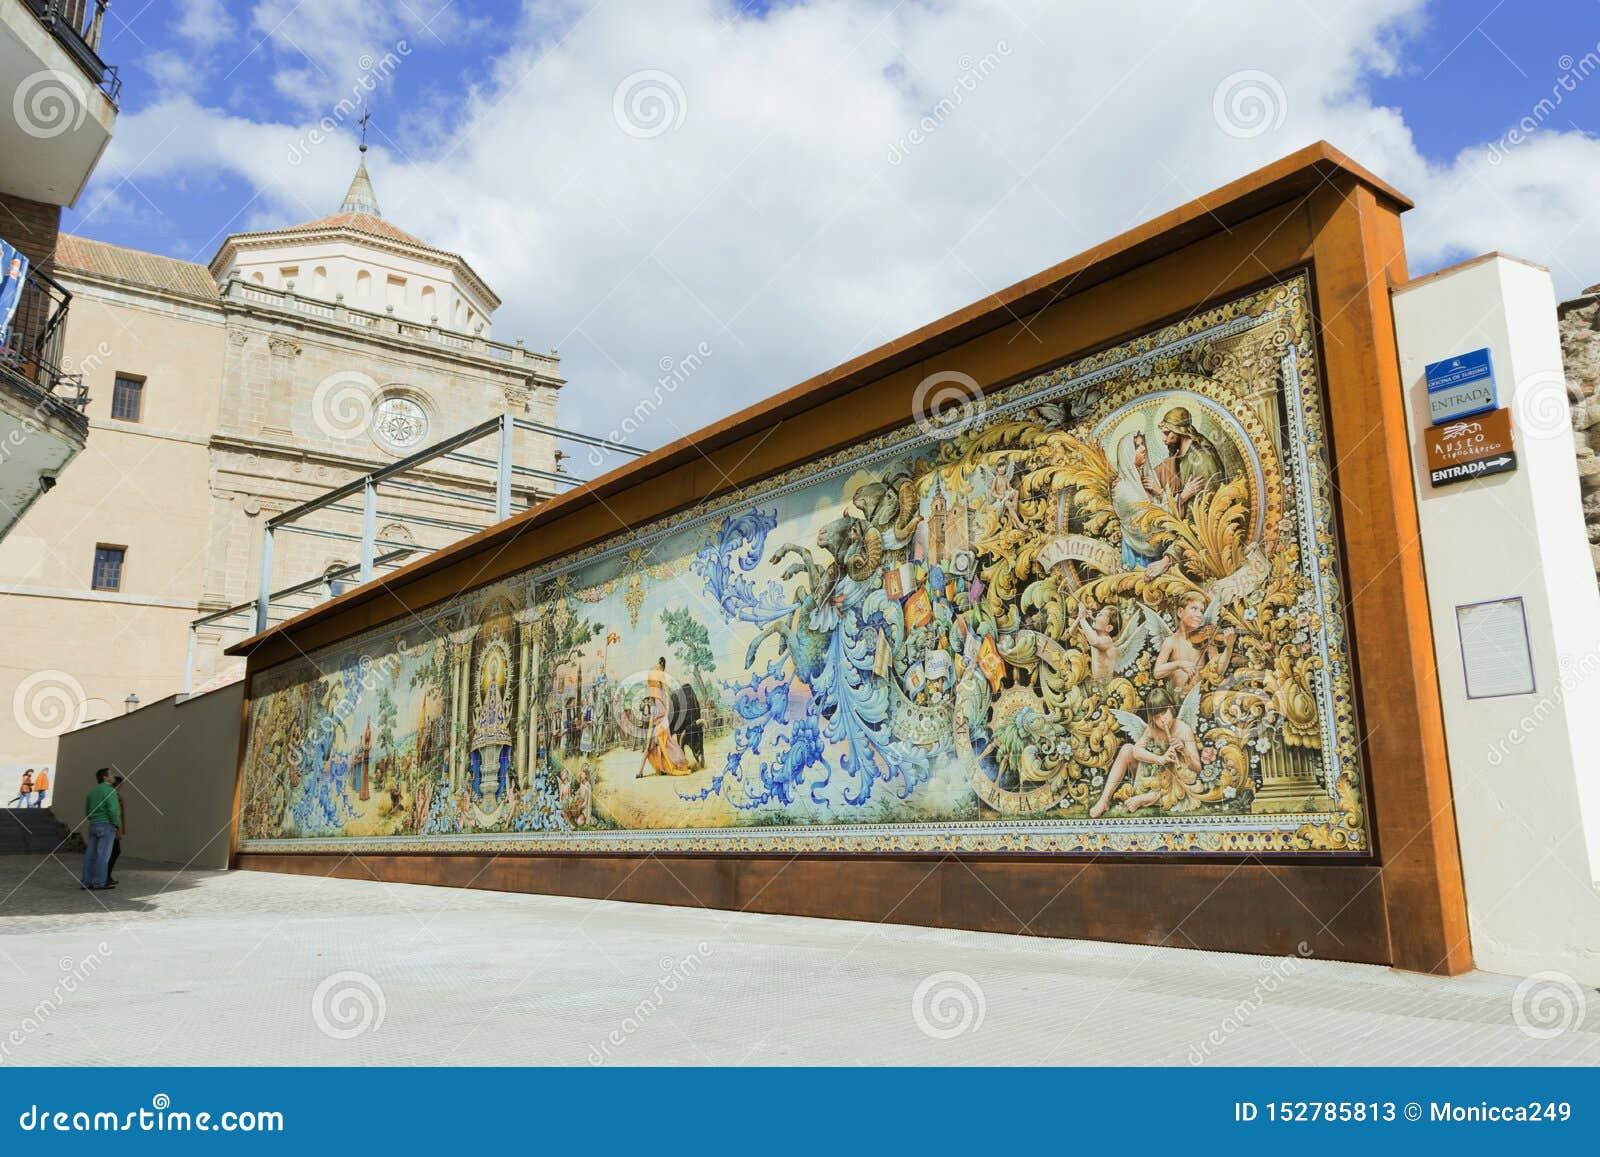 Peinture Murale En Céramique Espagnole Style De Ruiz De